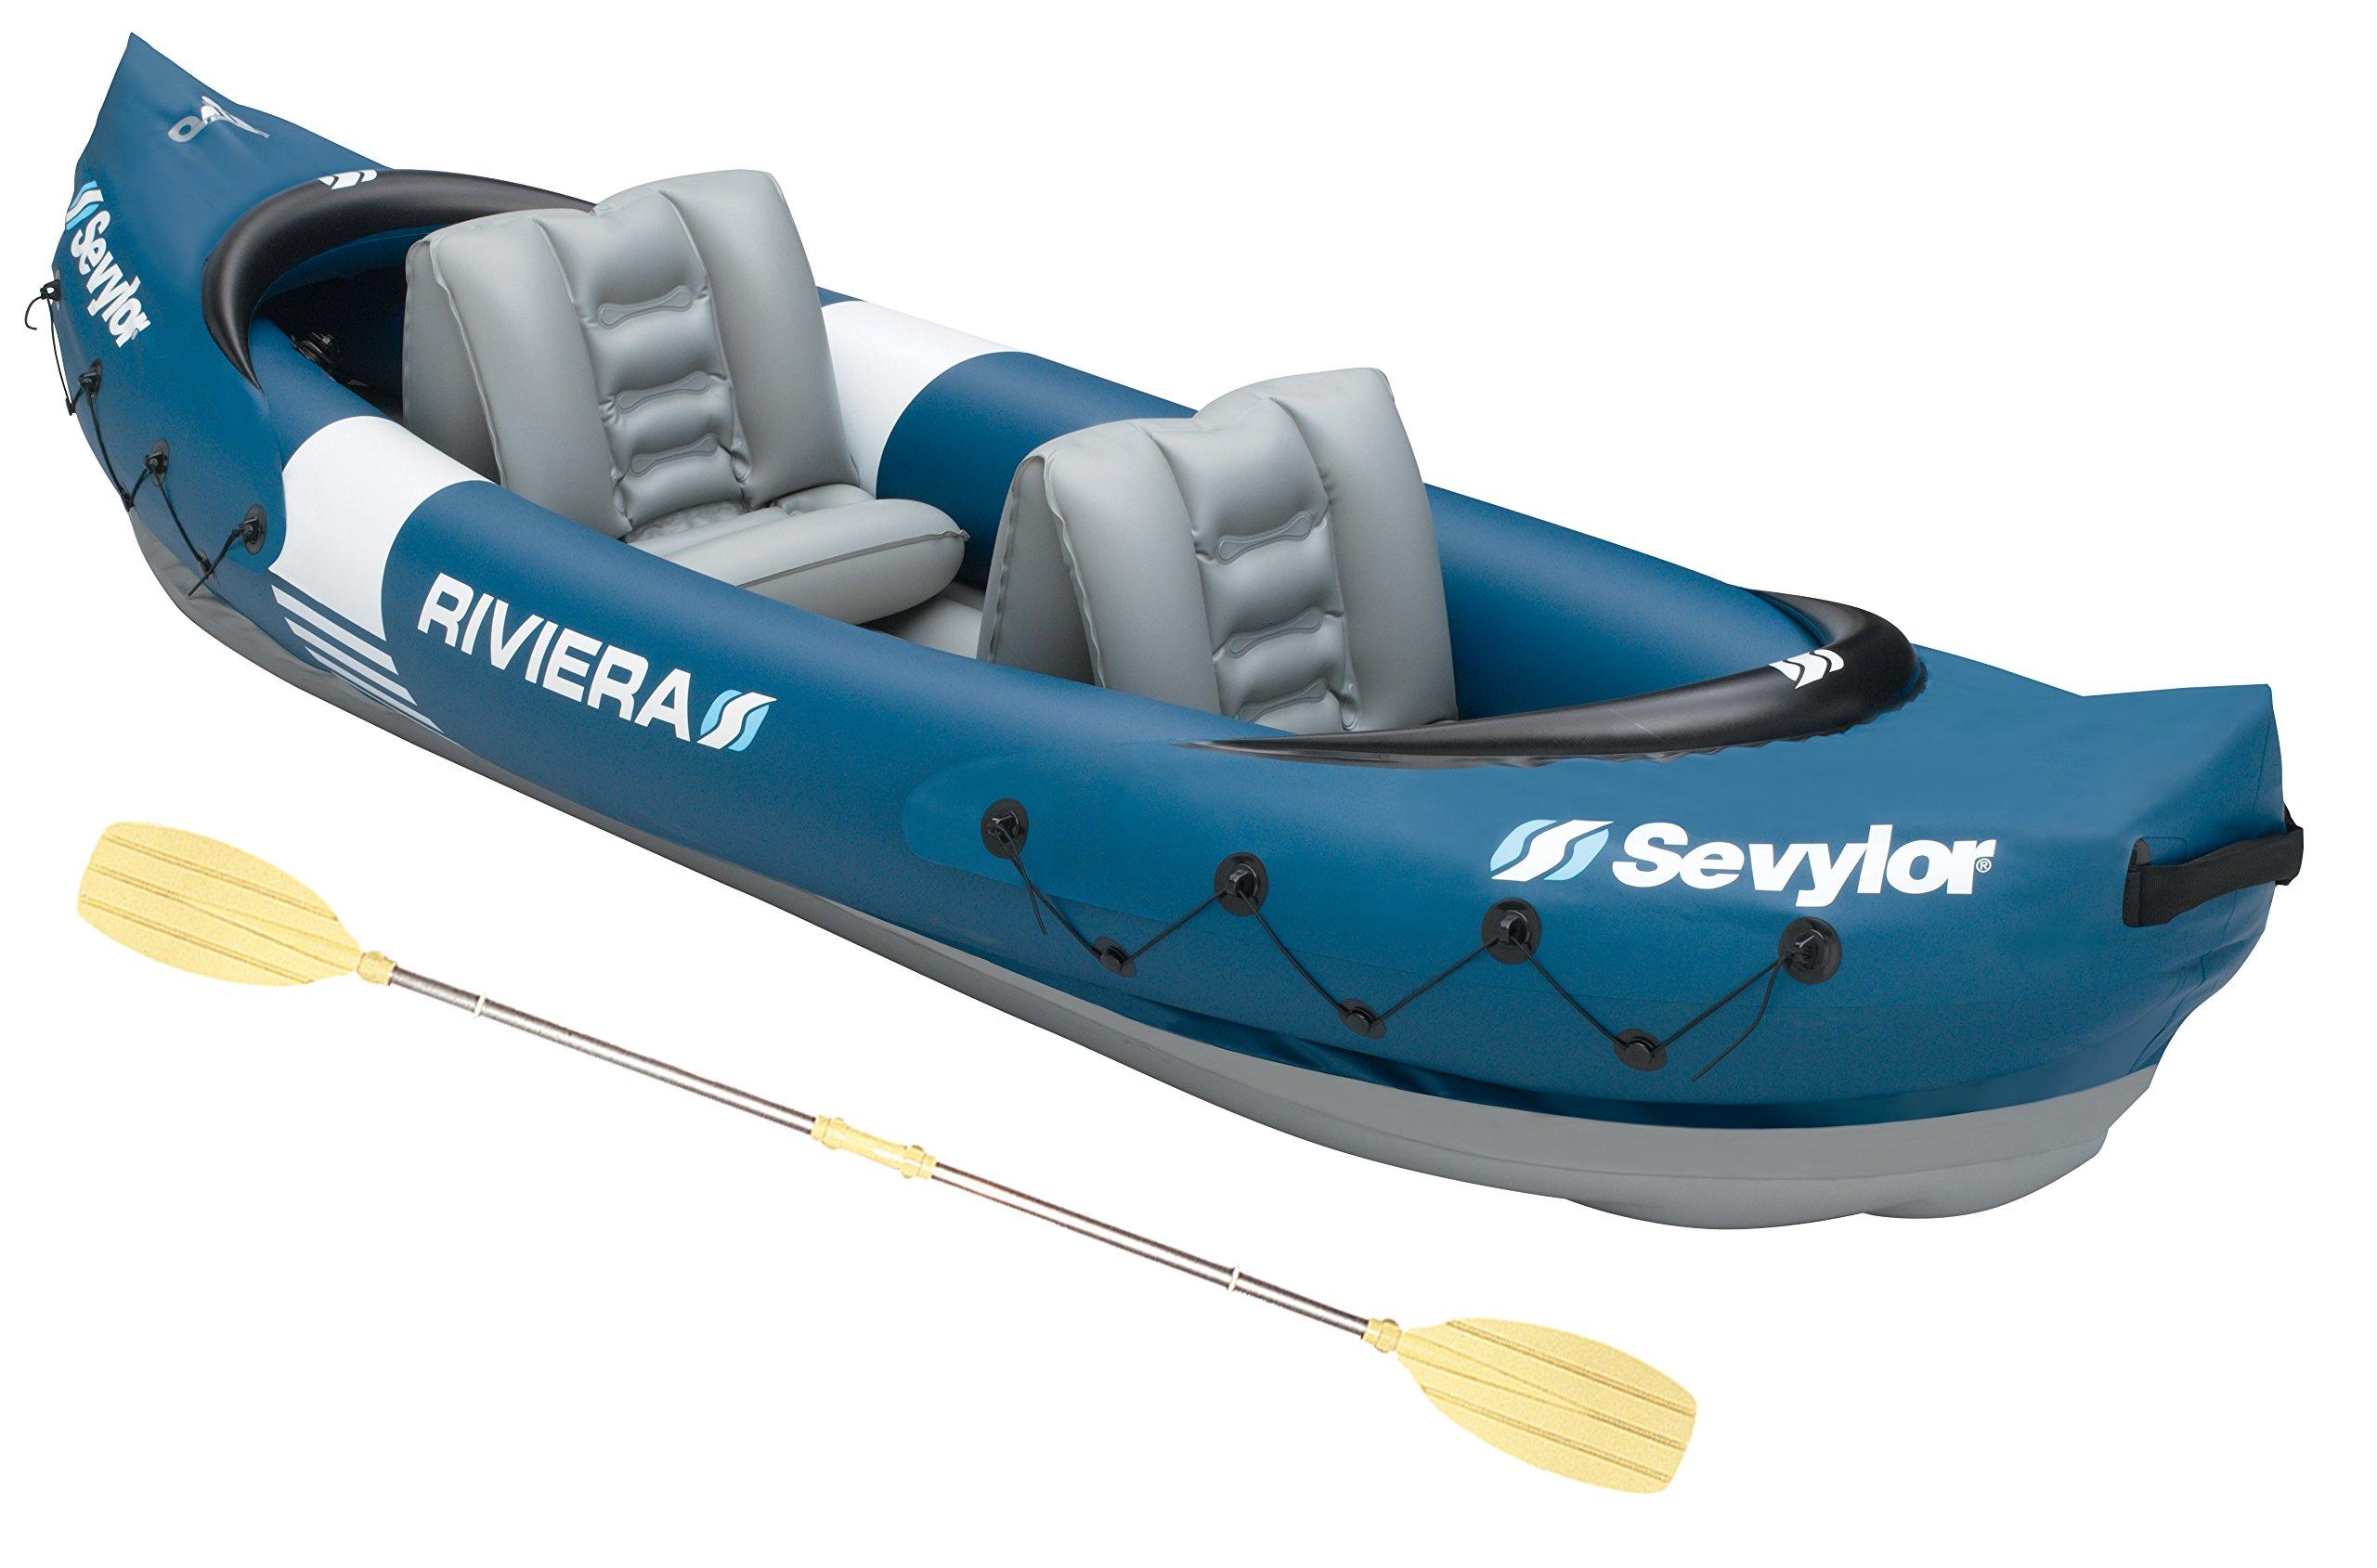 Sevylor Riviera 2P Kayak